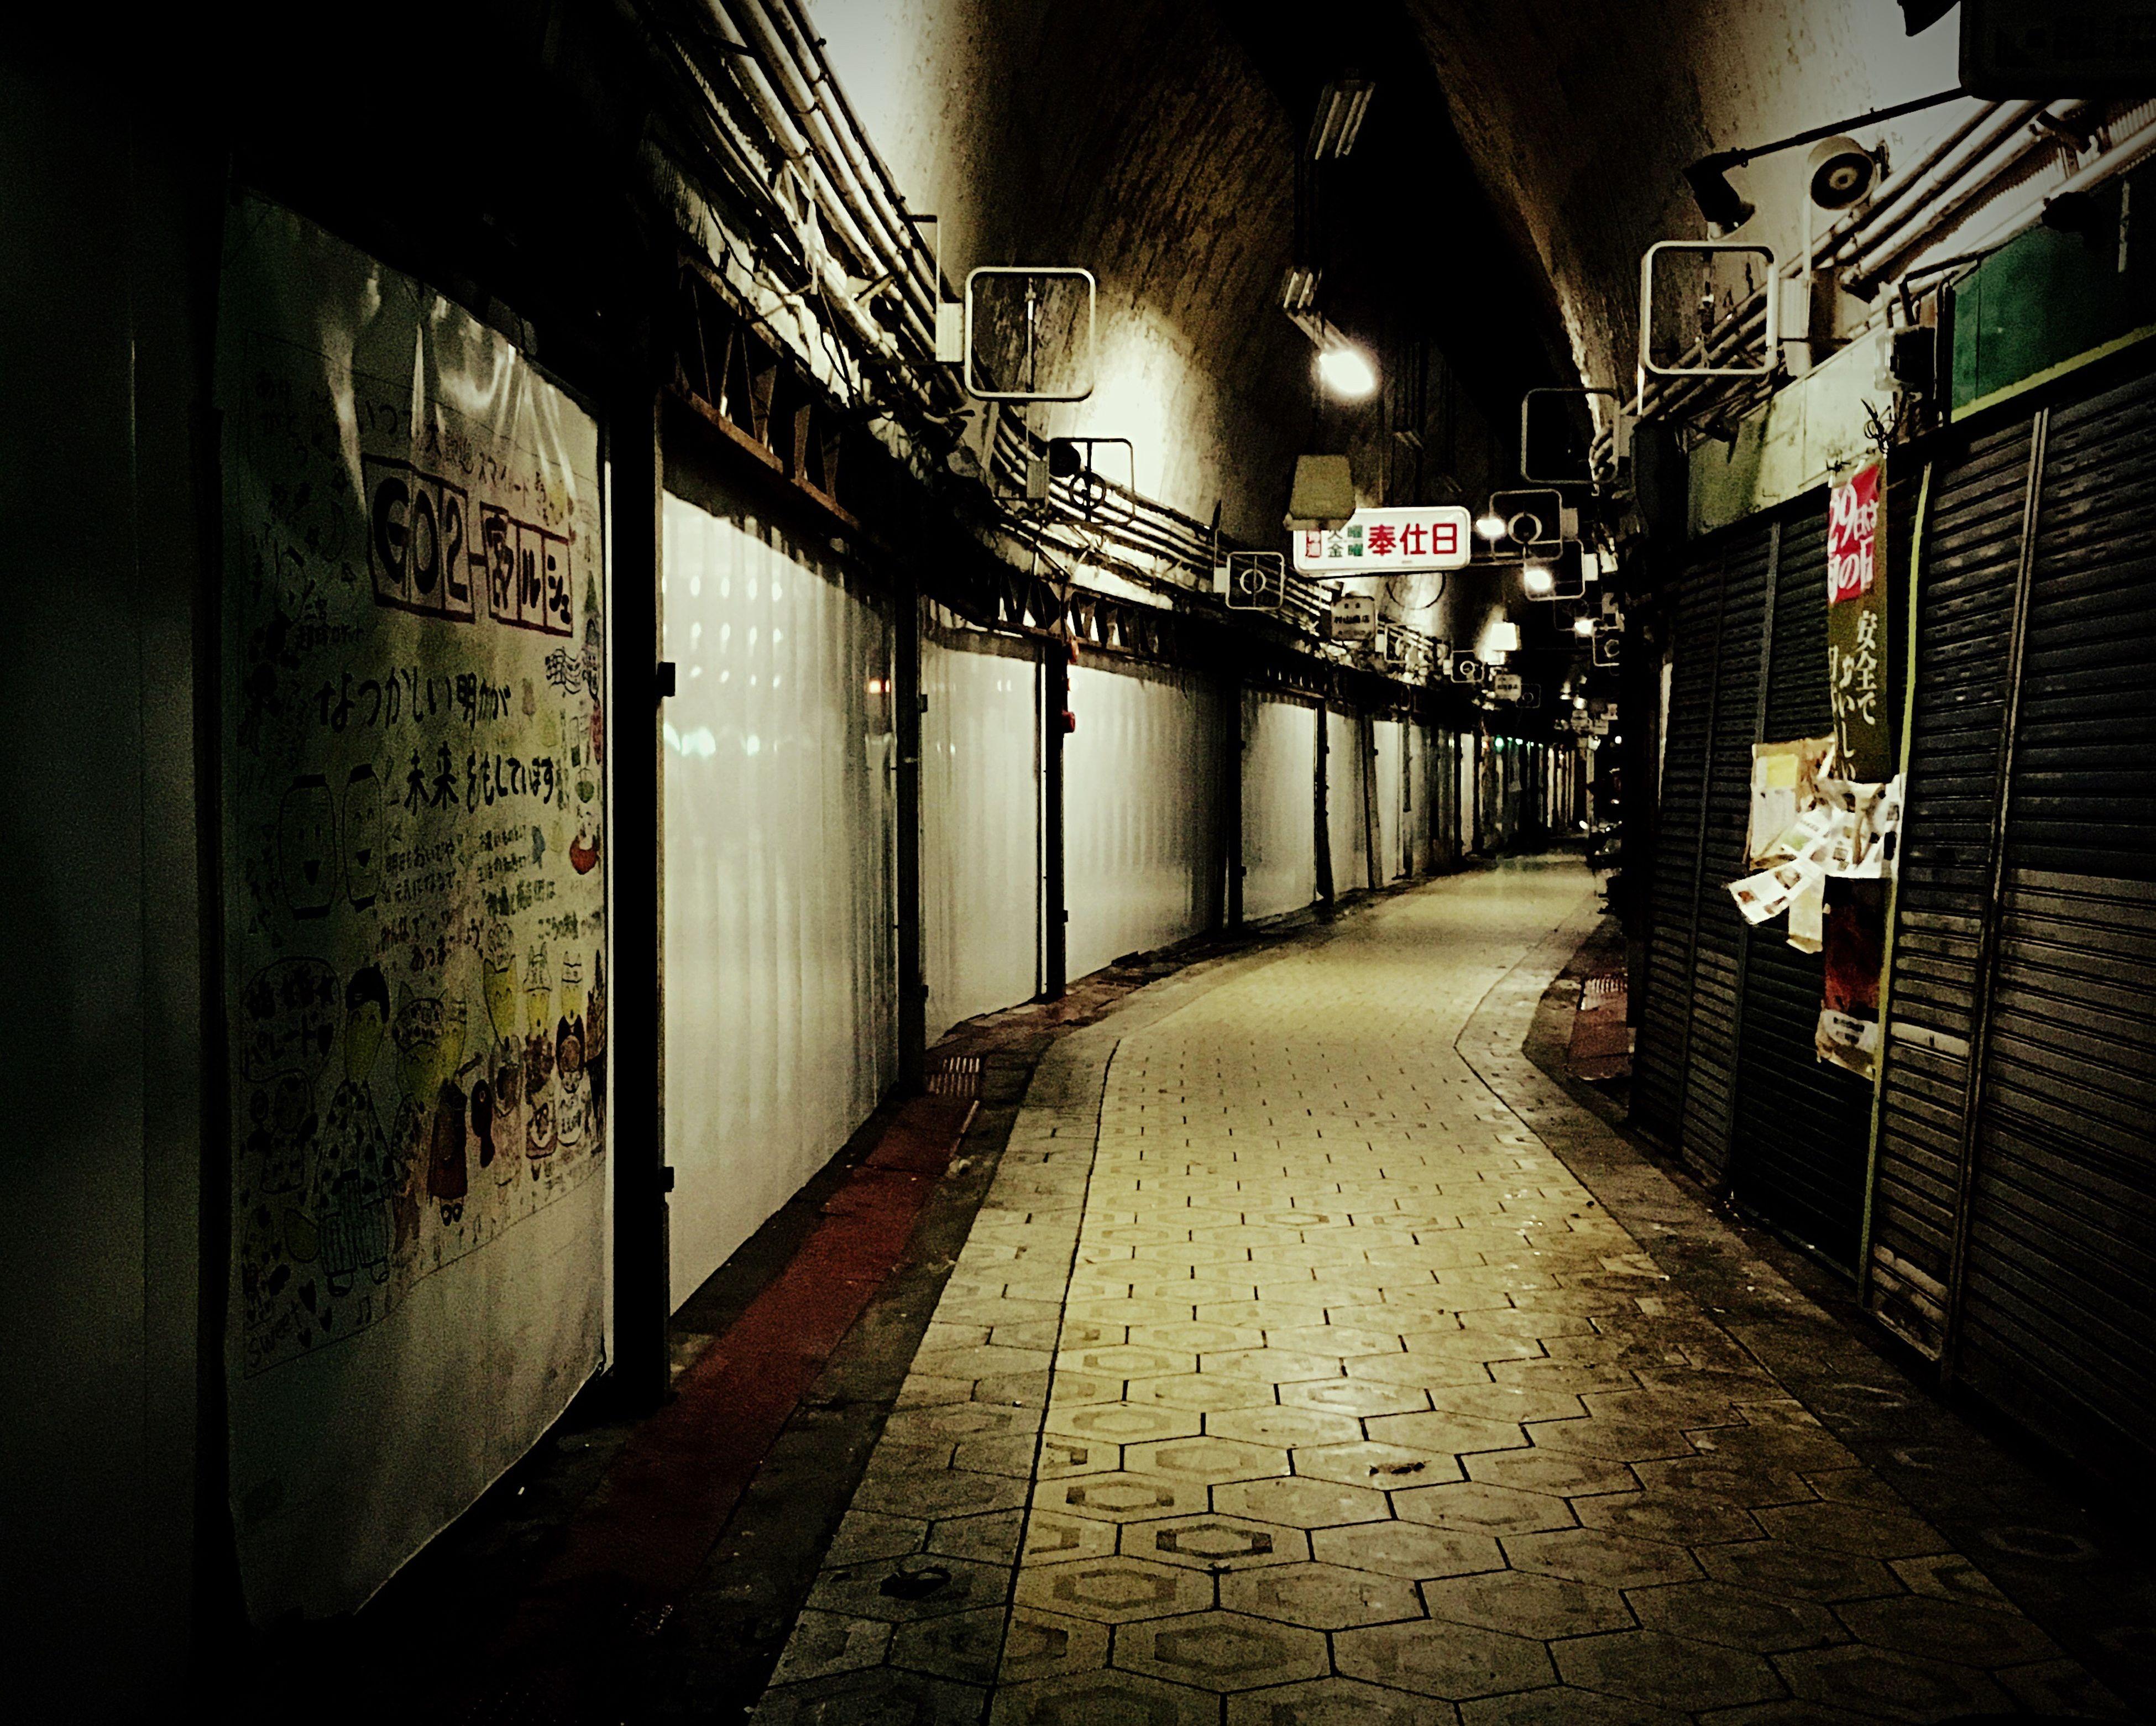 illuminated, architecture, night, city, indoors, no people